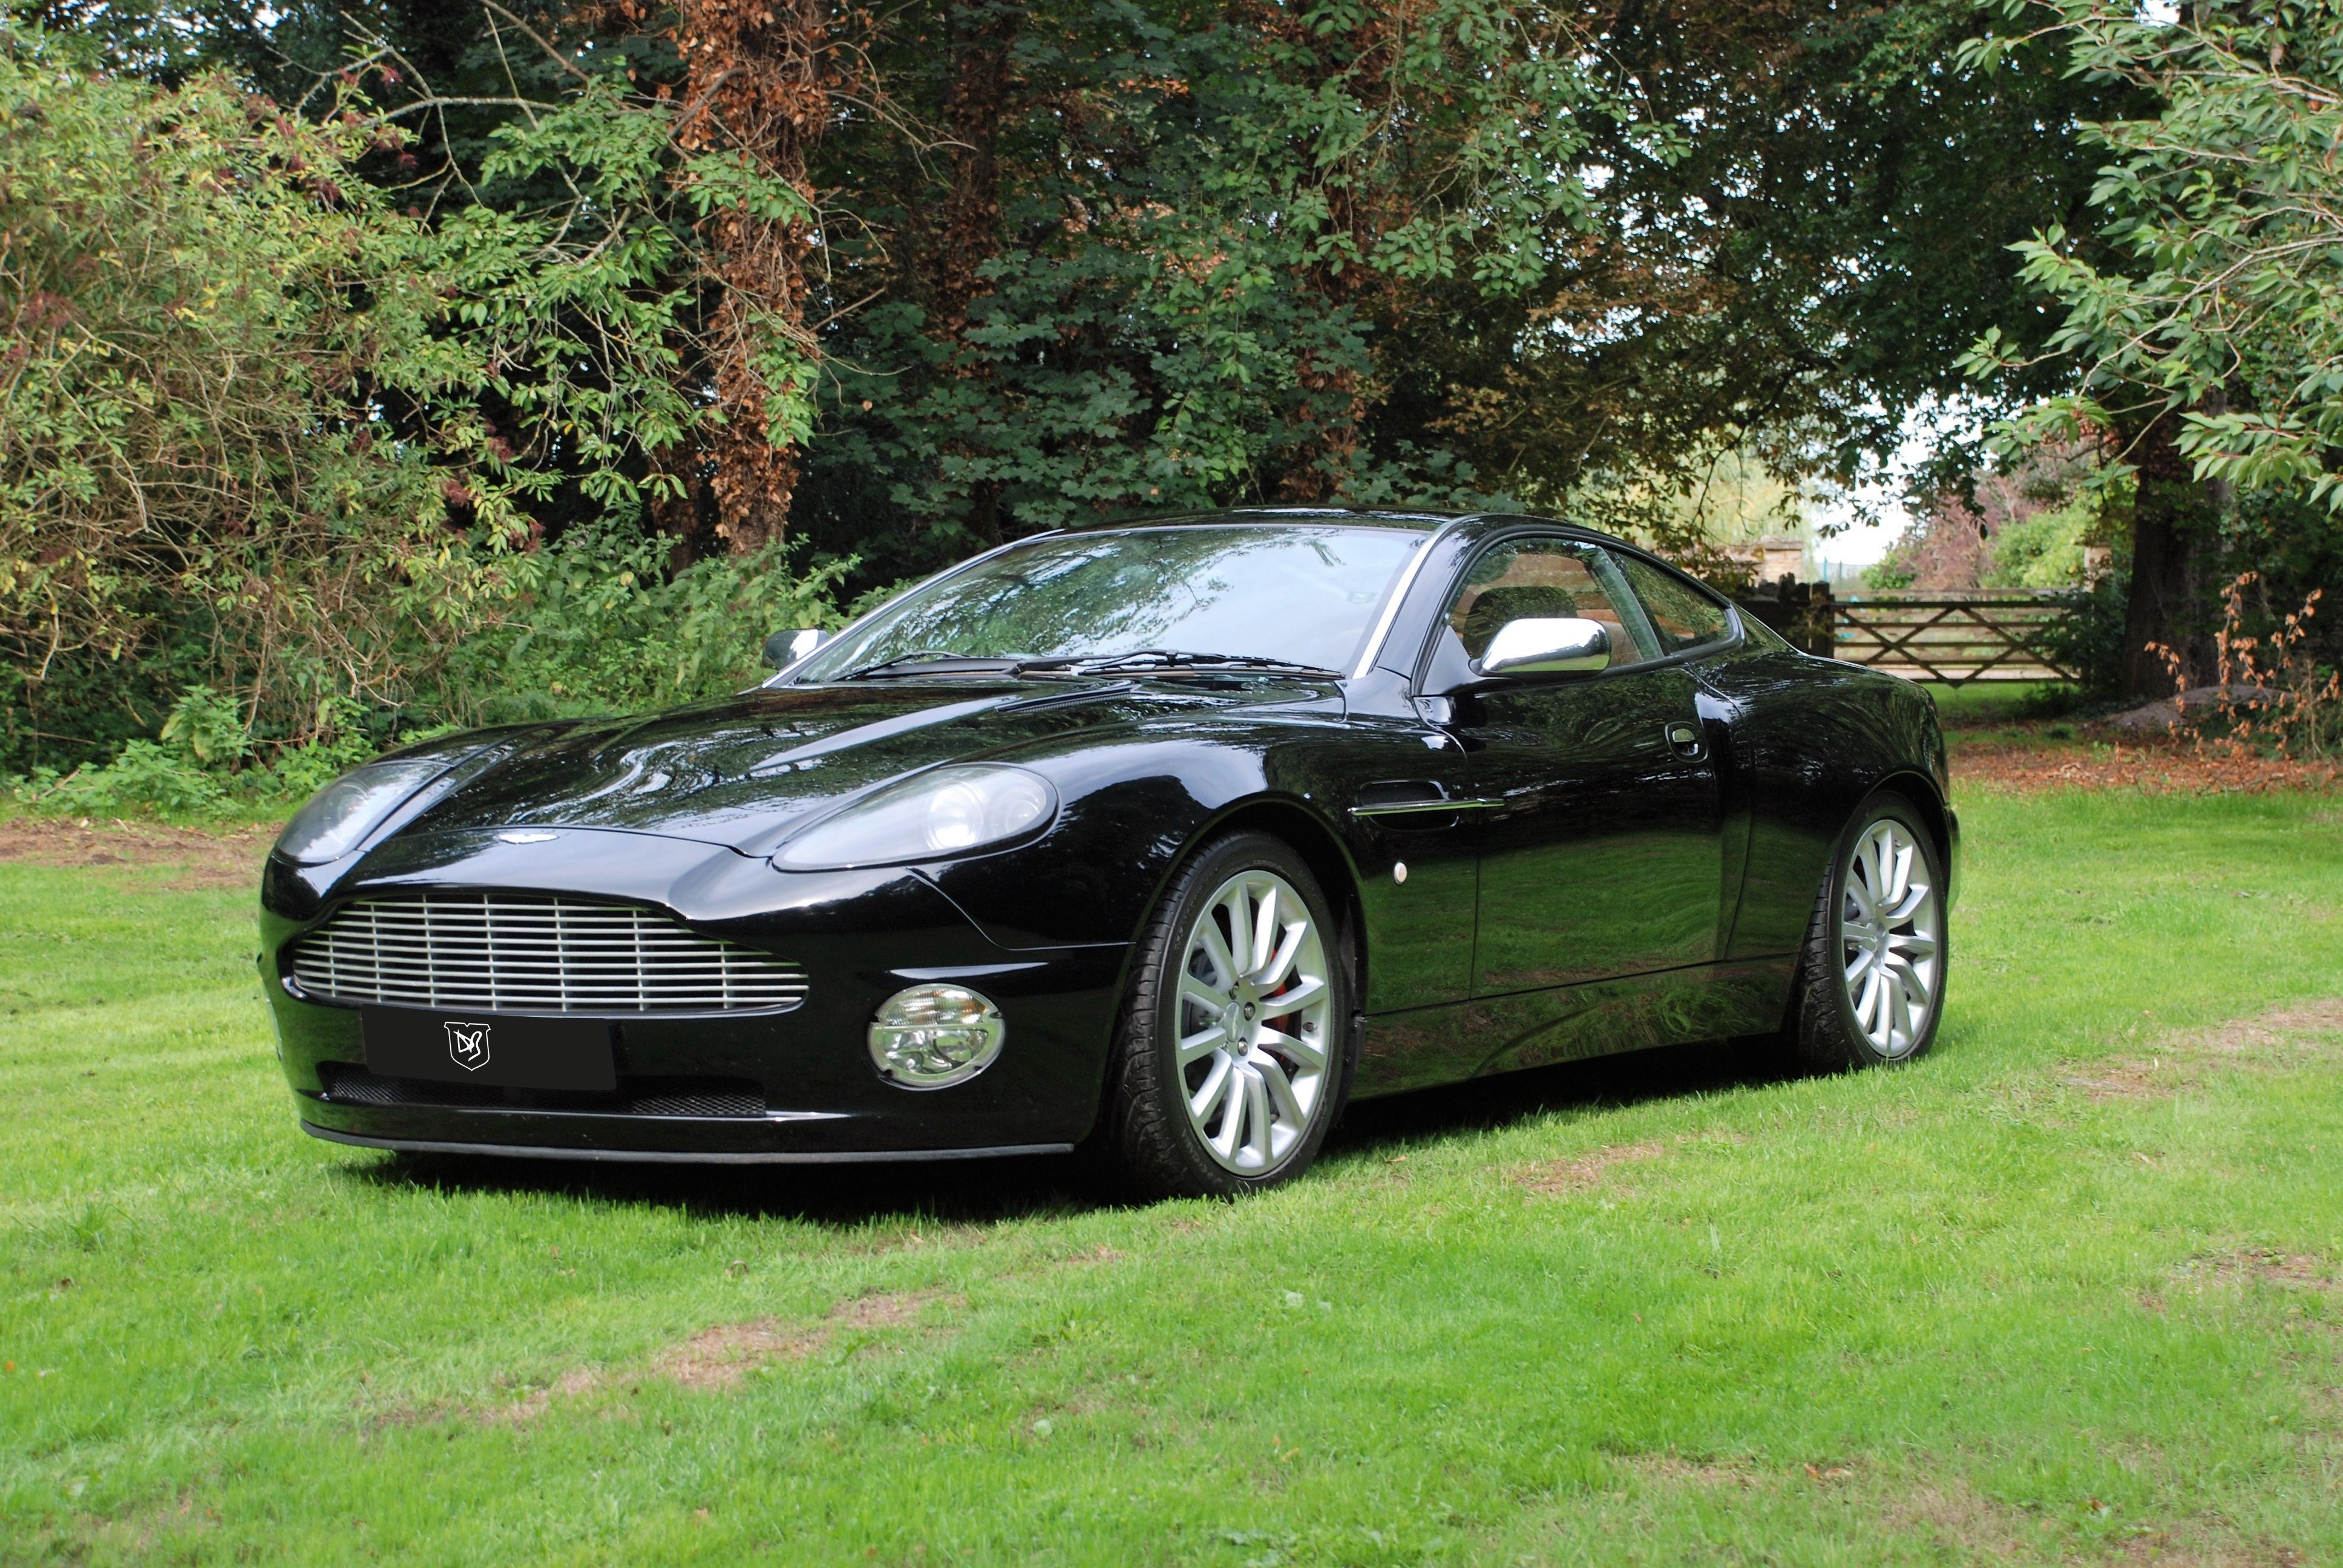 2004 Aston Martin Vanquish V12 Vanquish